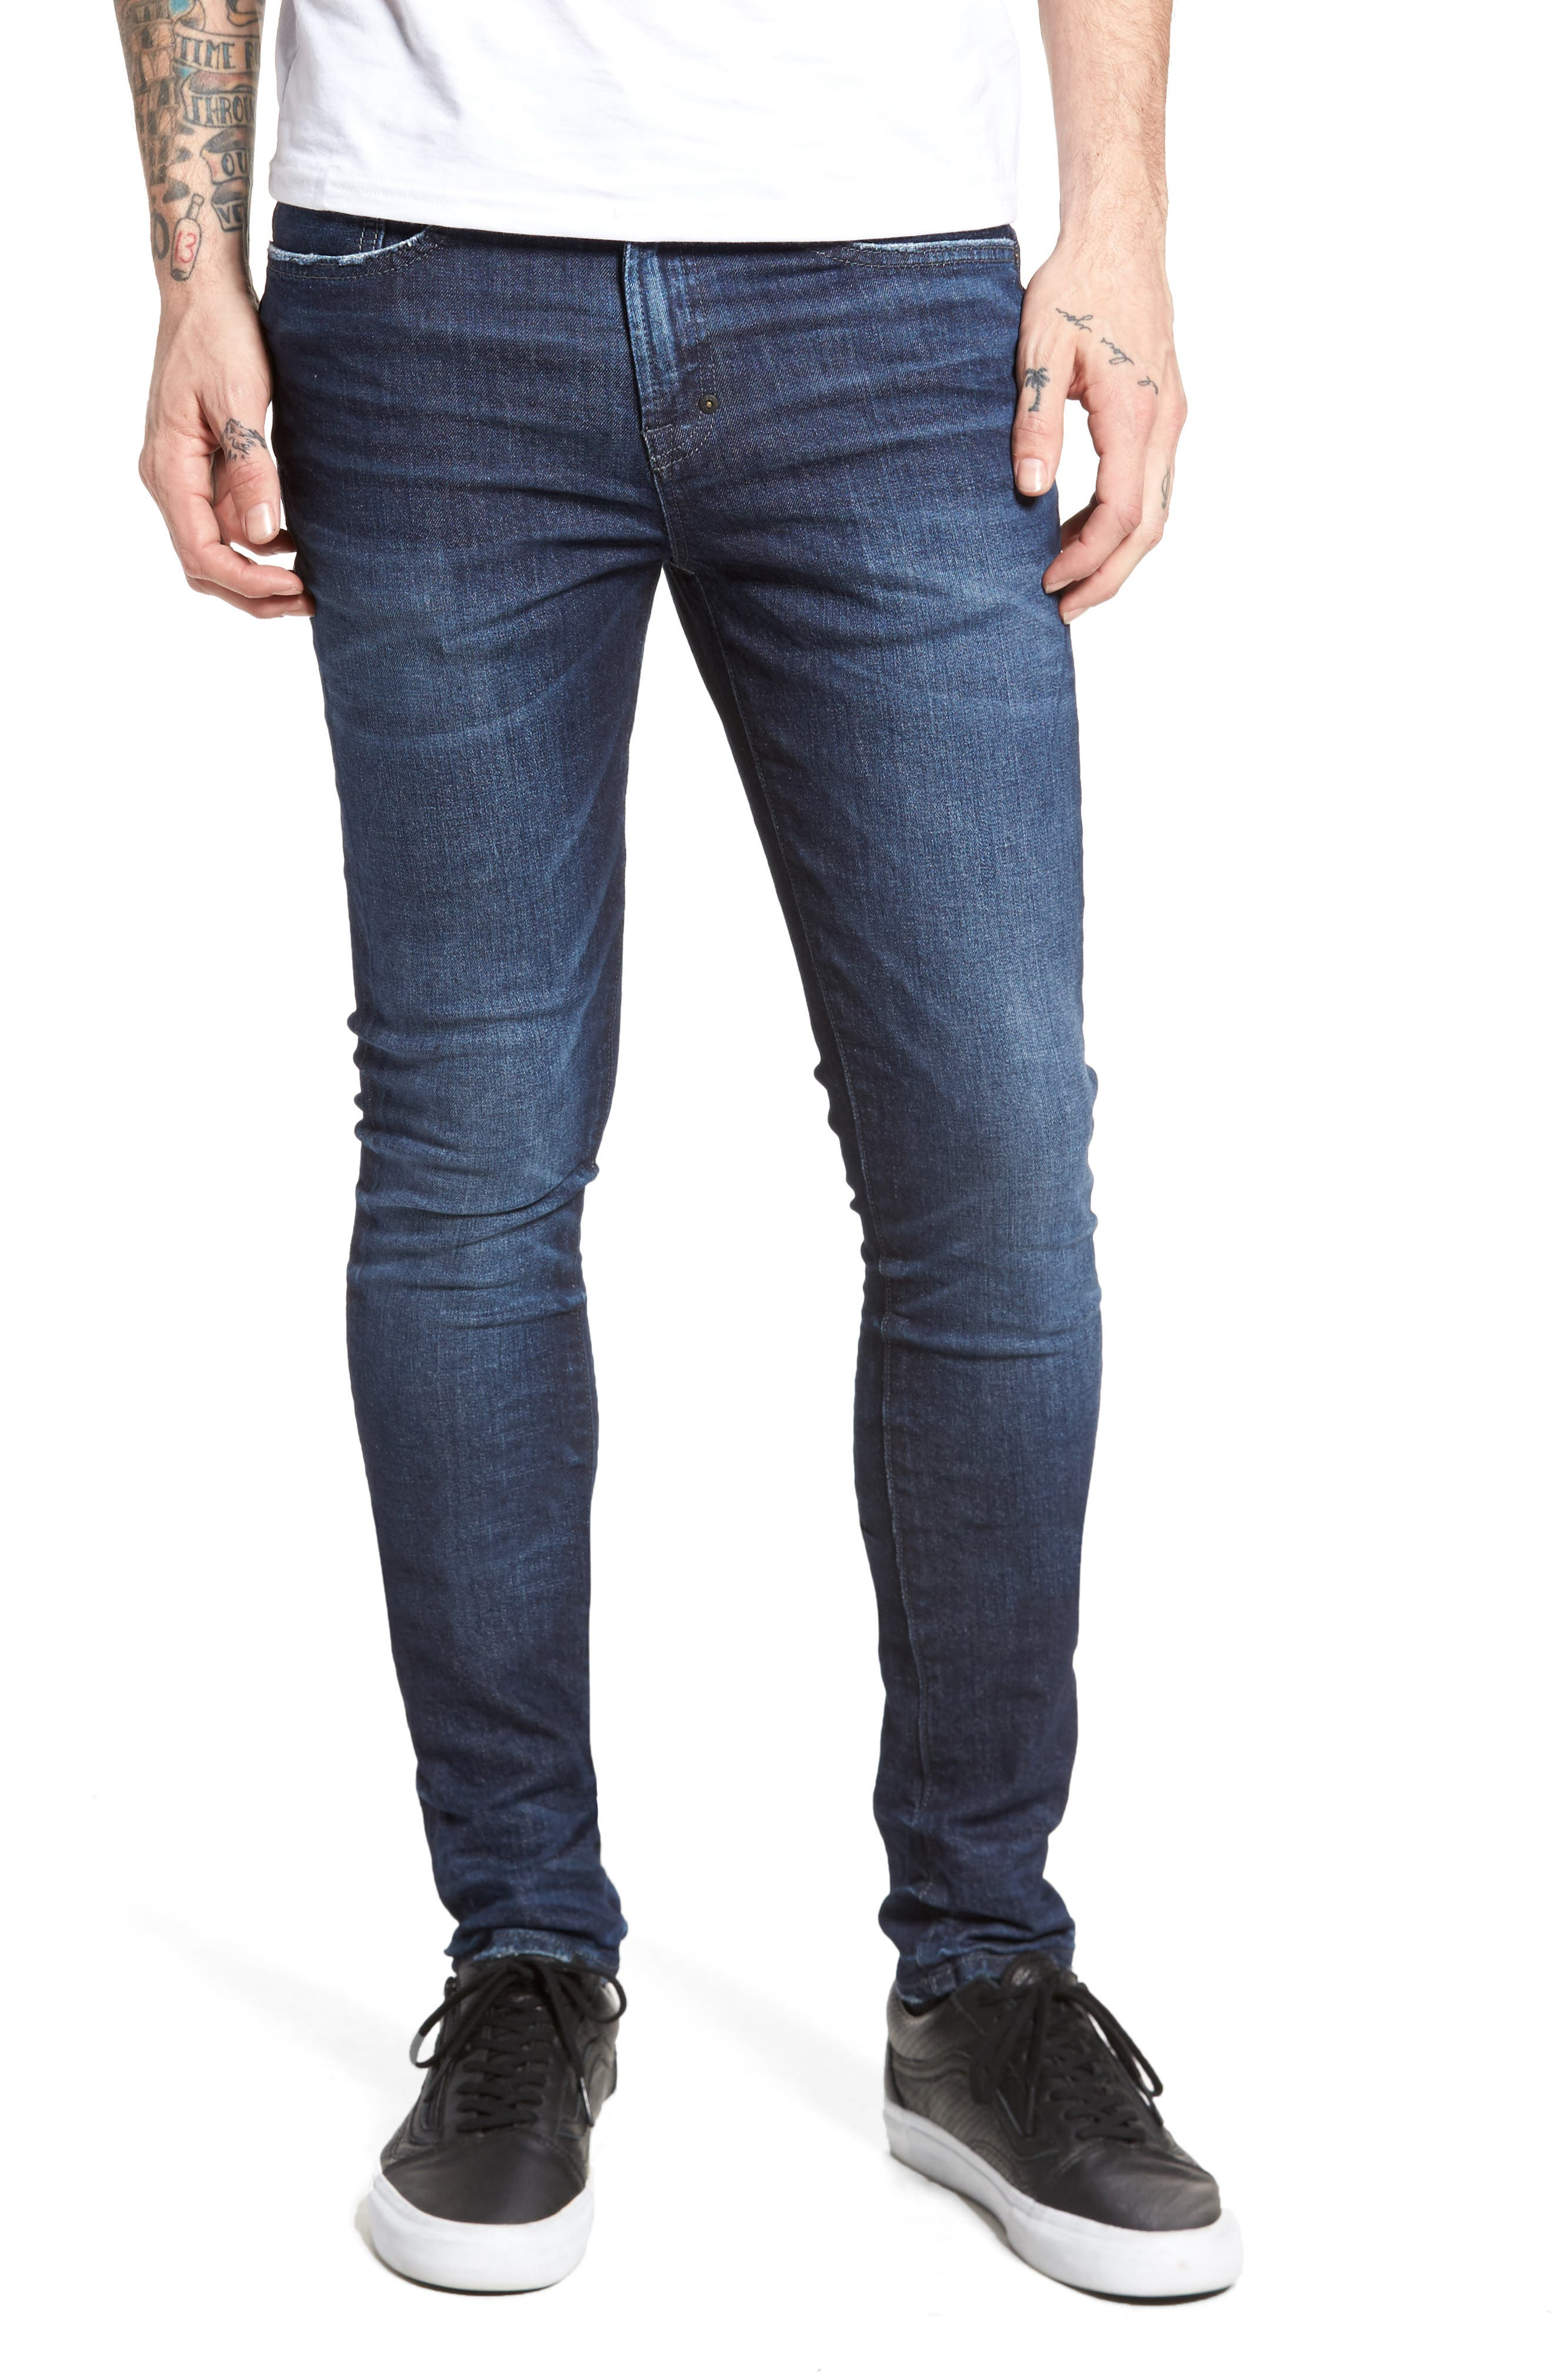 Windsor Slim Fit Jeans,                             Main thumbnail 1, color,                             Dark Blue